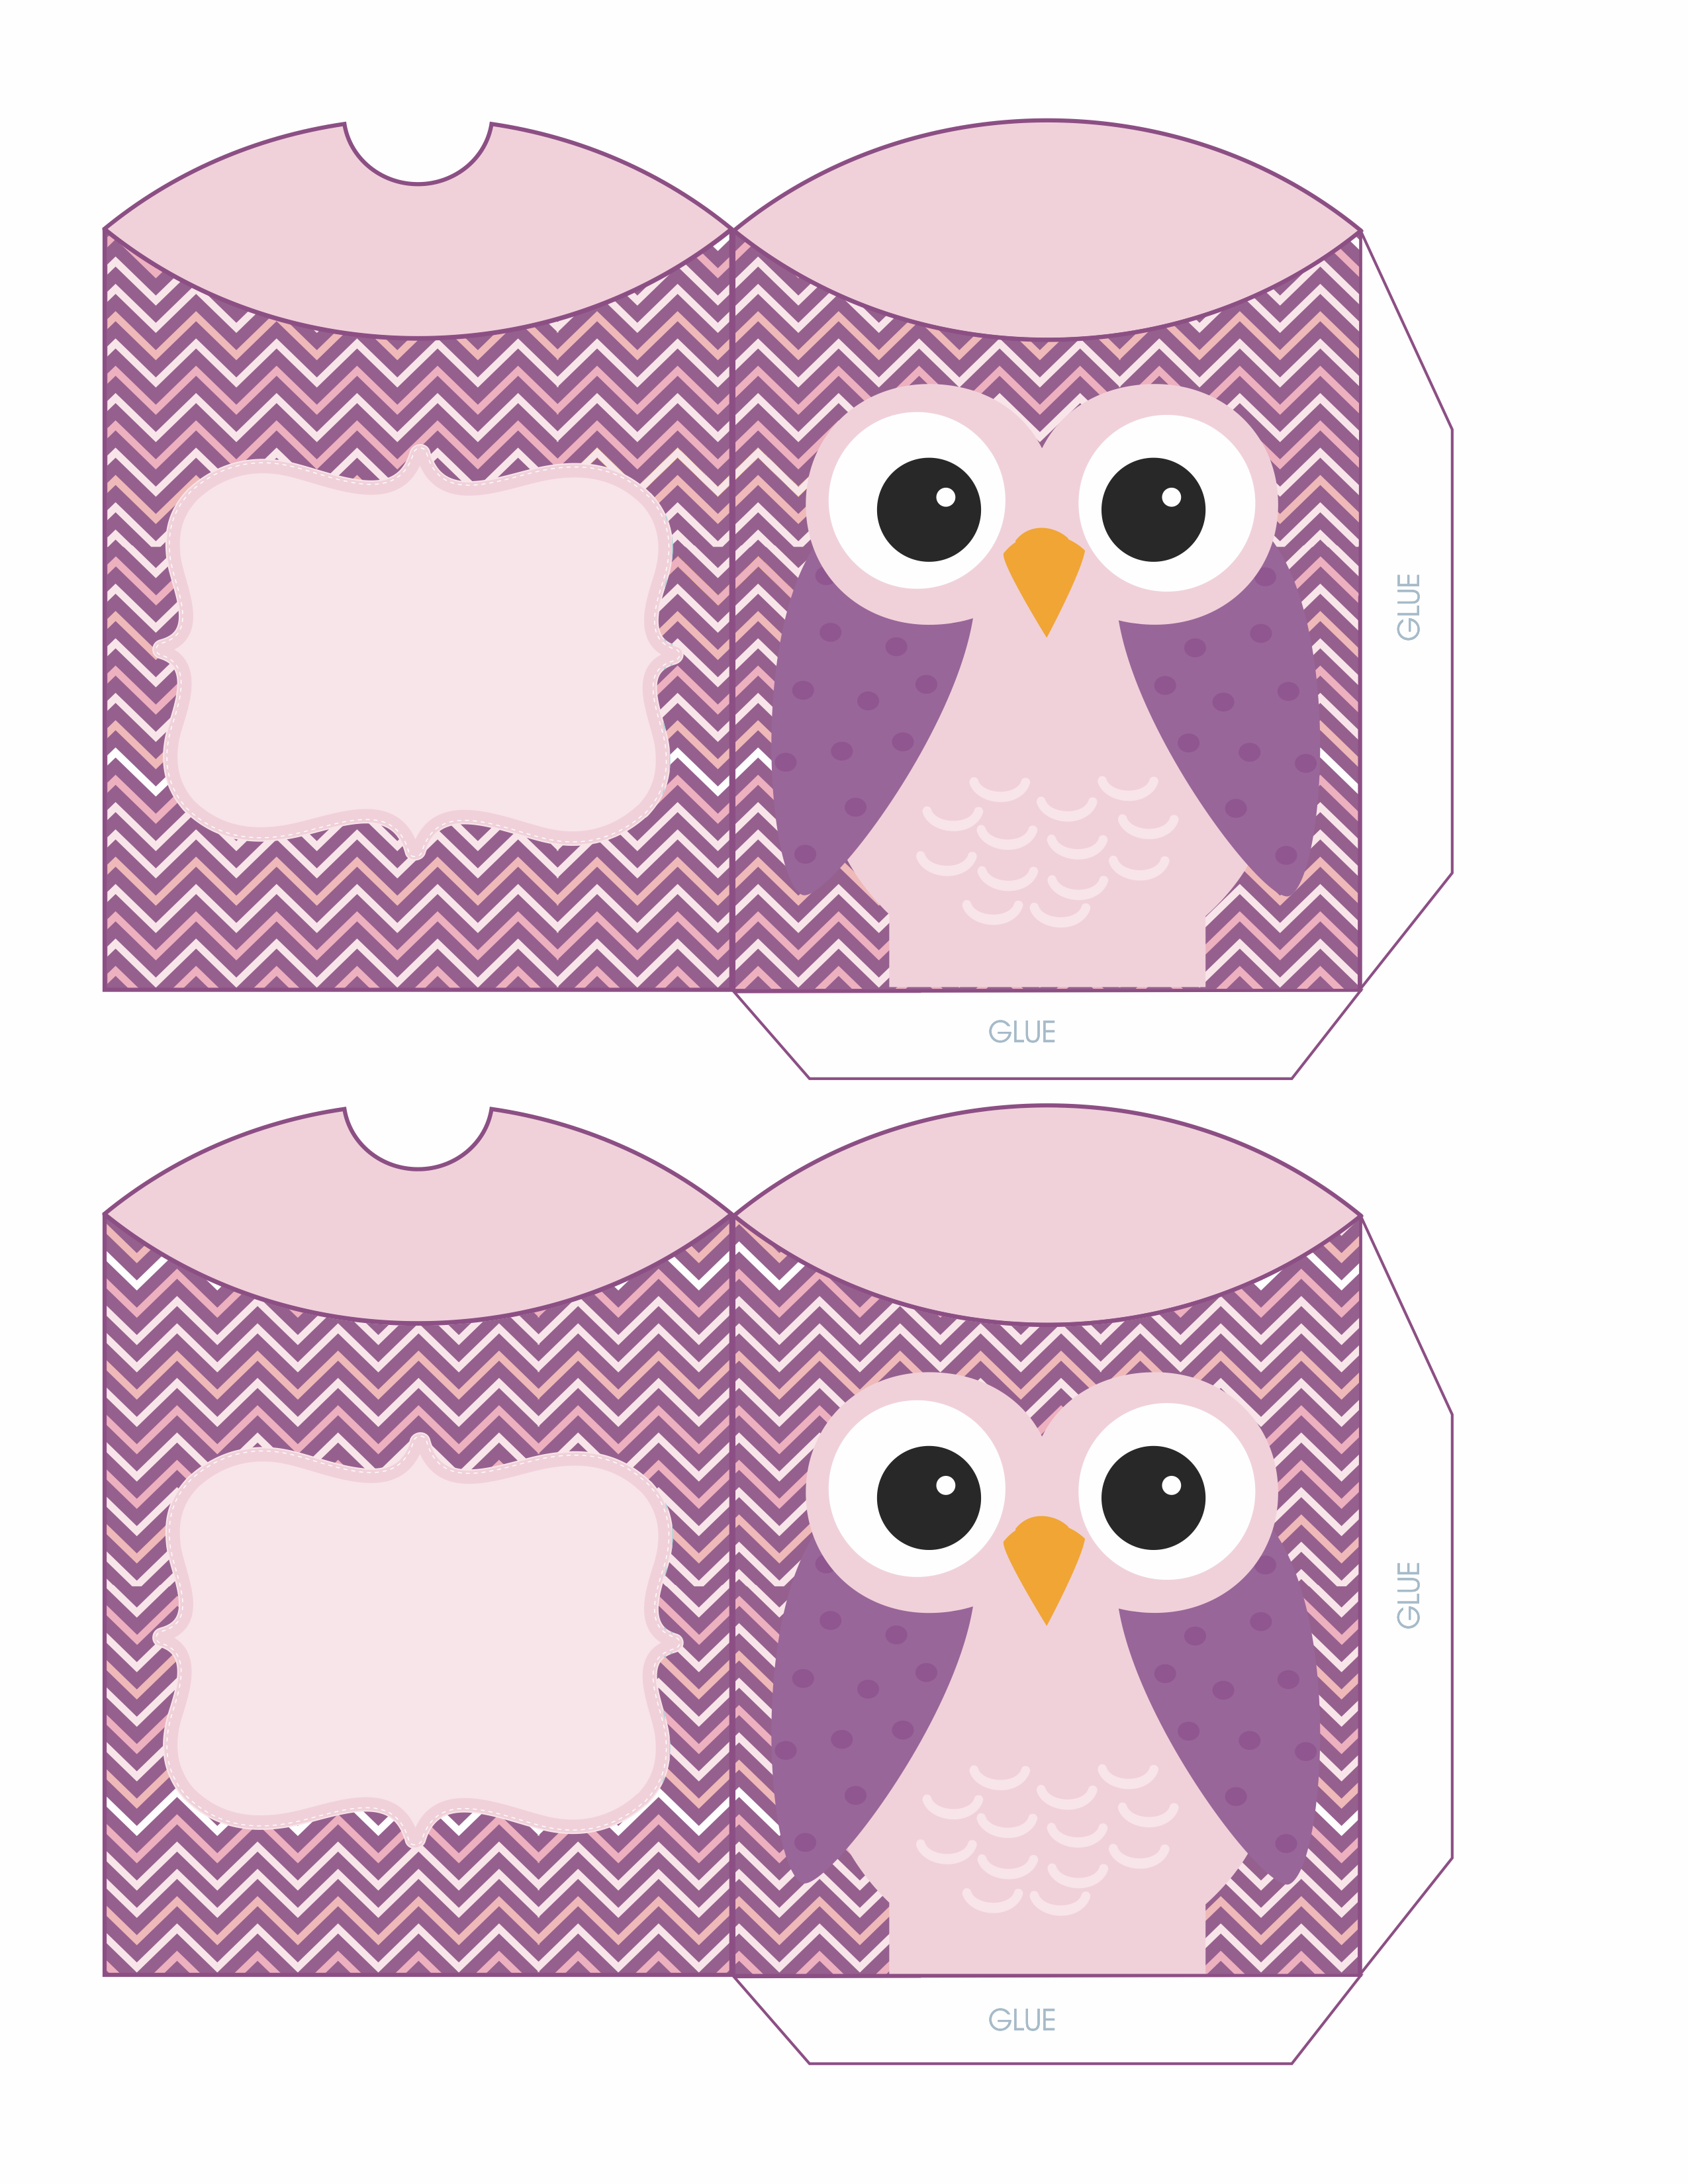 purple owl boxes envelopes pinterest owl box owl and box